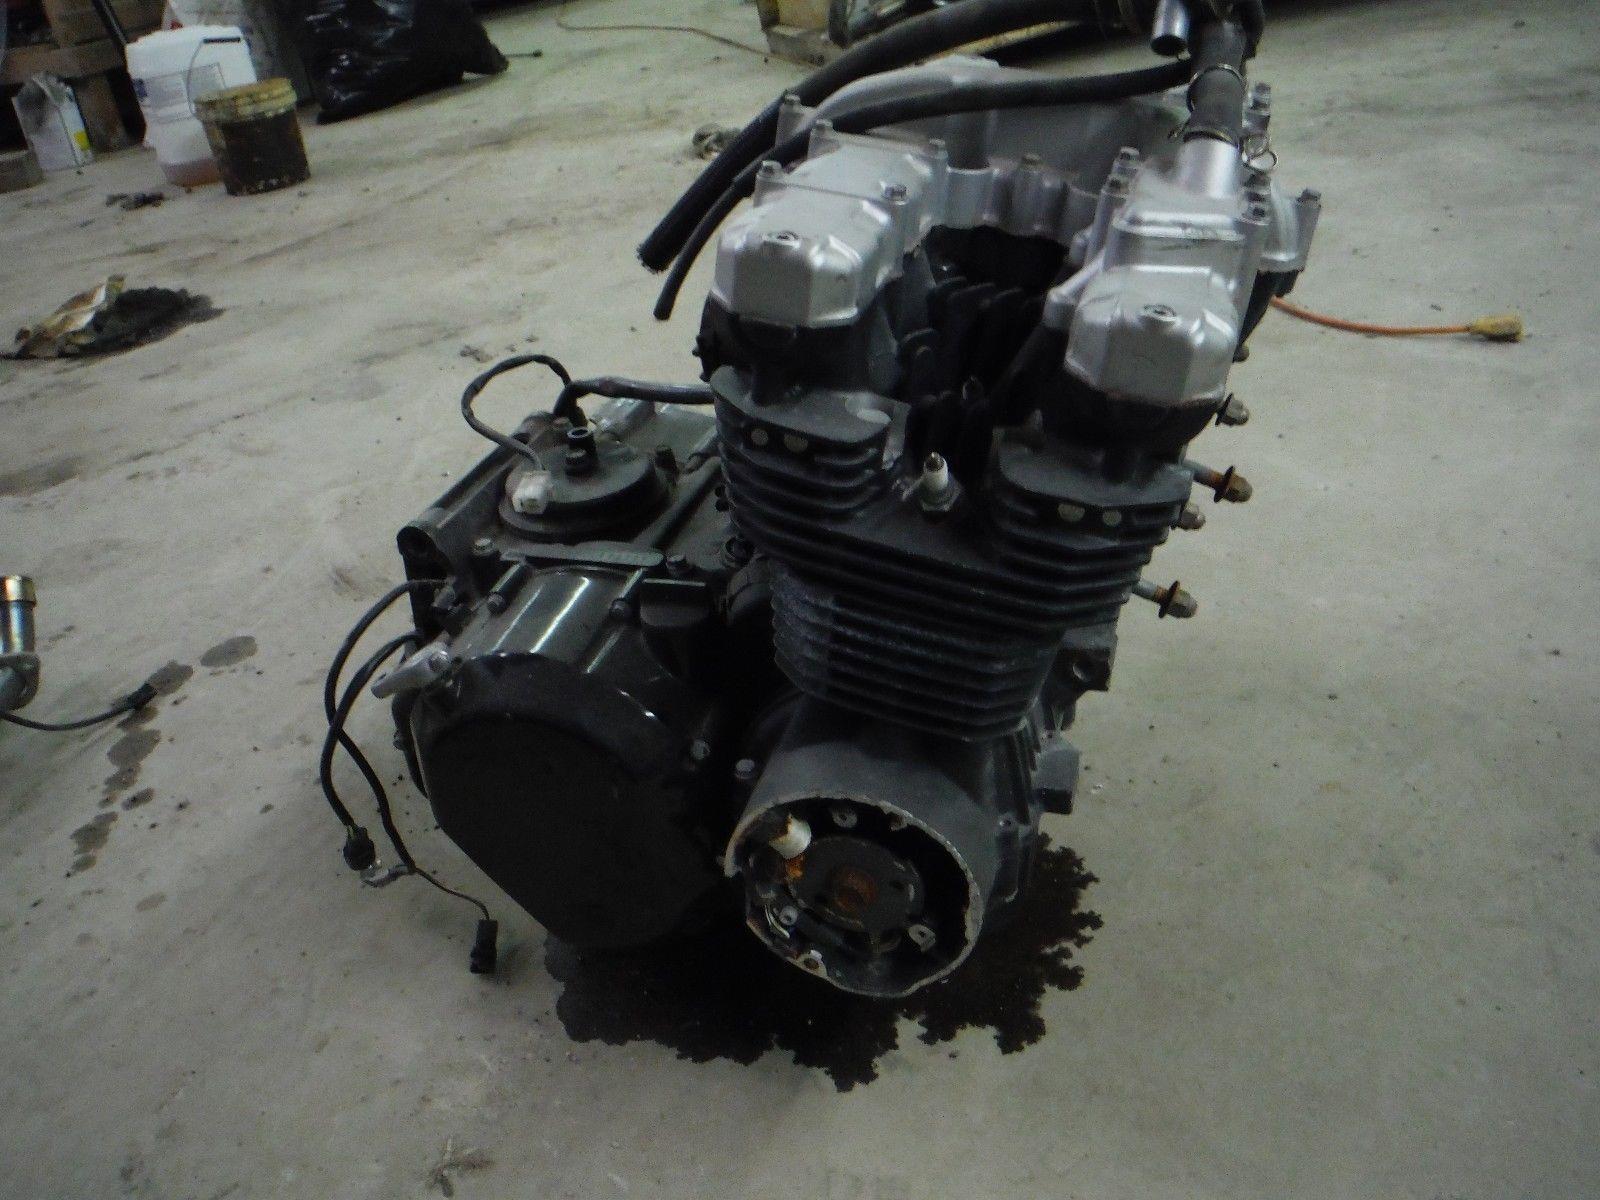 00 01 02 Kawasaki ZR7S ZR 7 S 750 Engine Motor *Timing cover damage ...